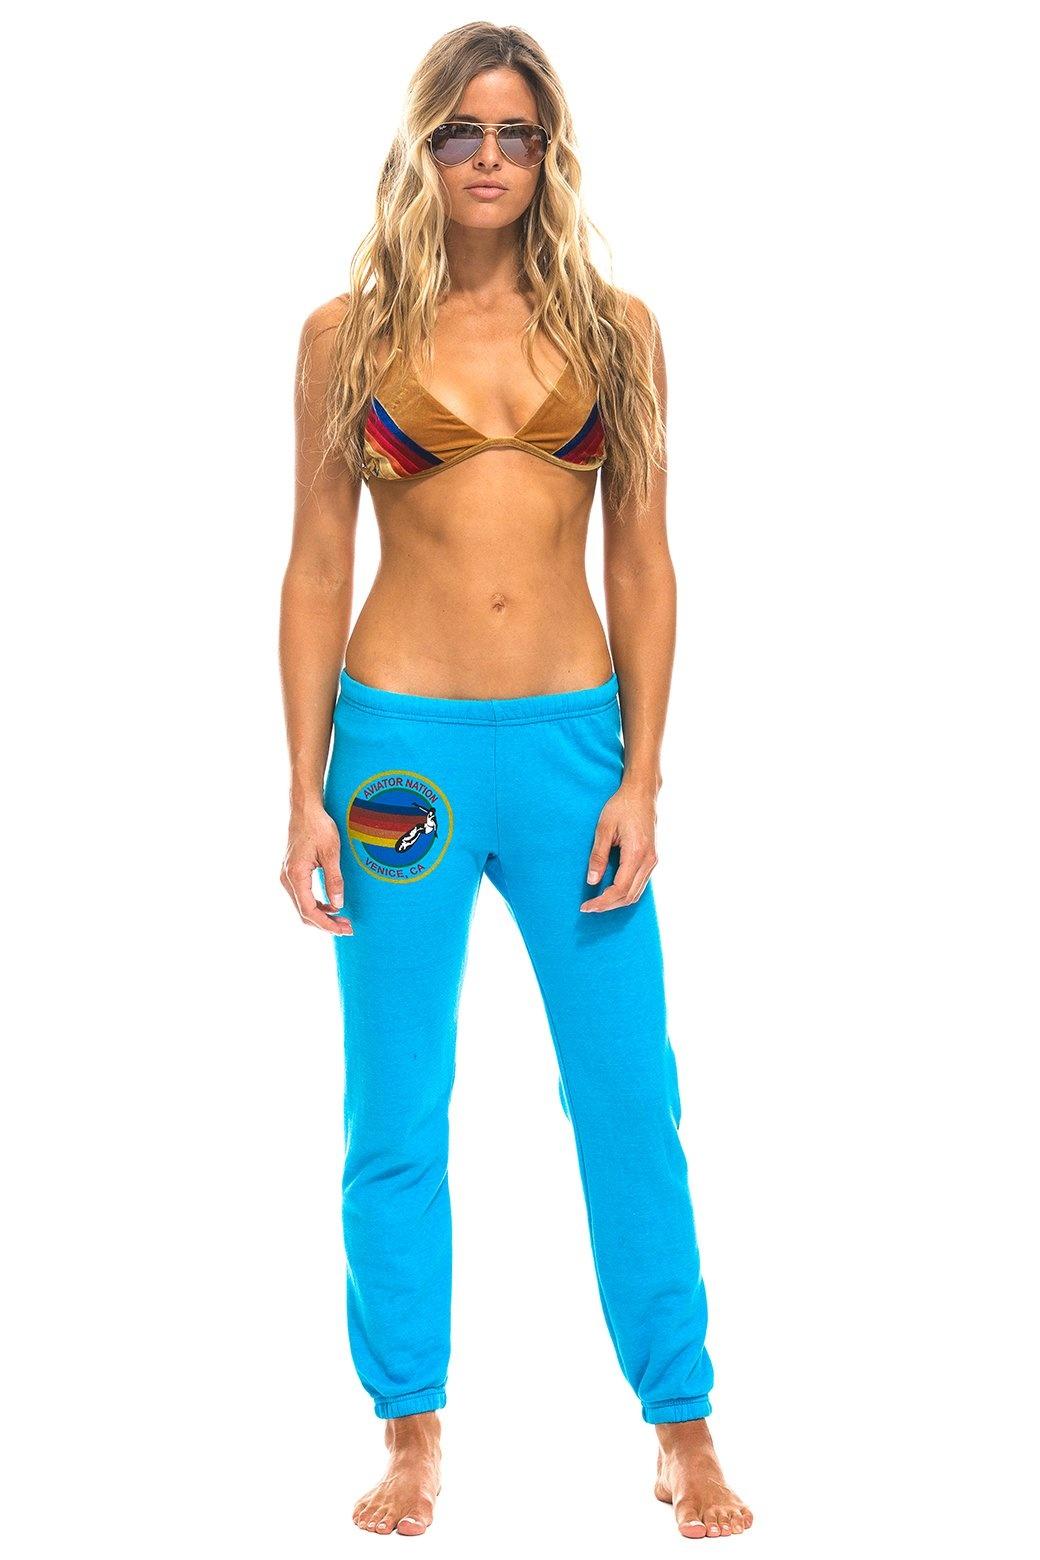 Aviator Nation AN Womens Sweatpant Neon Blue